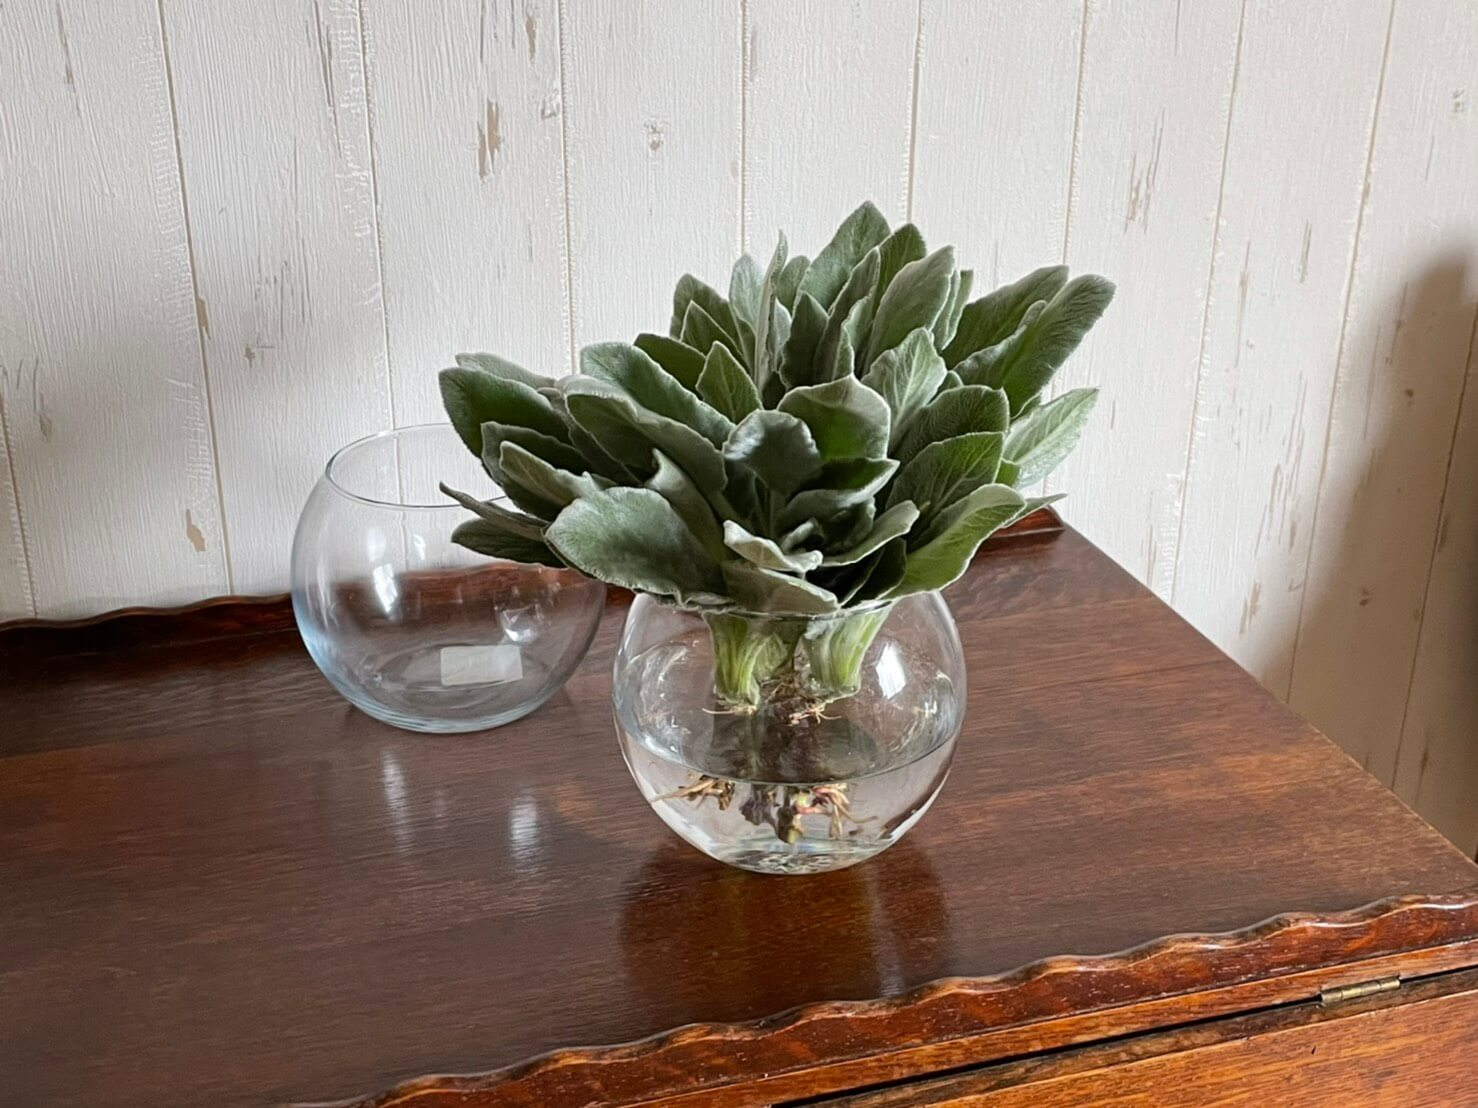 Anchor Hocking Glass Flower Bowl 丸い形のフラワーベース